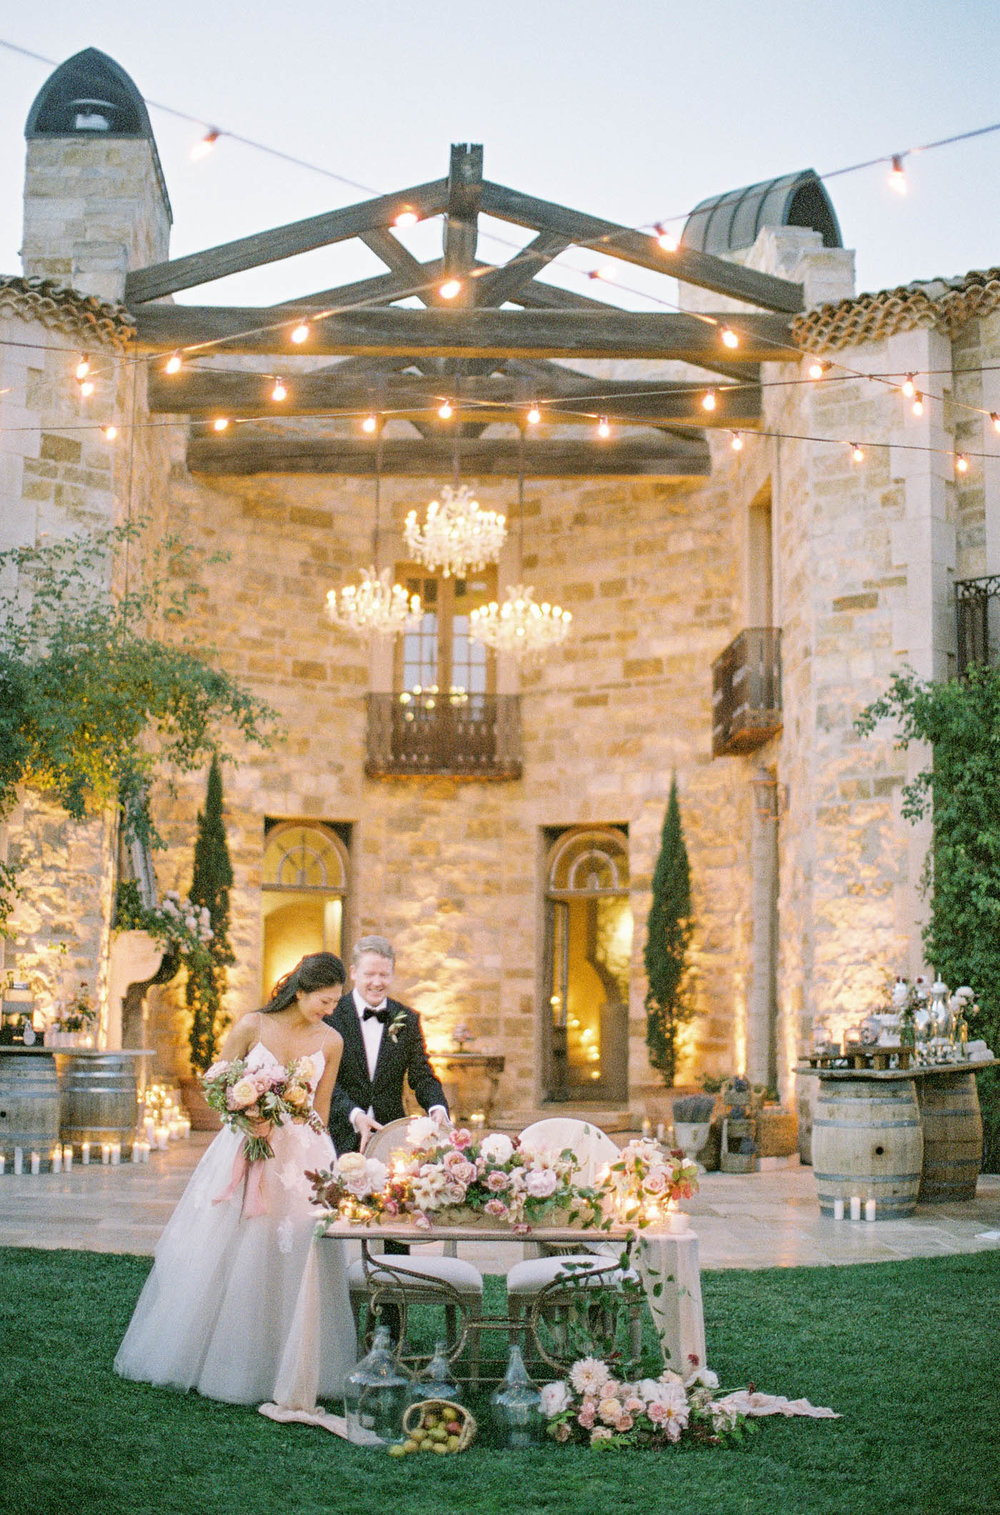 sunstone-villa-wedding-37-Jen_Huang-RD-188-Jen_Huang-009573-R1-012.jpg